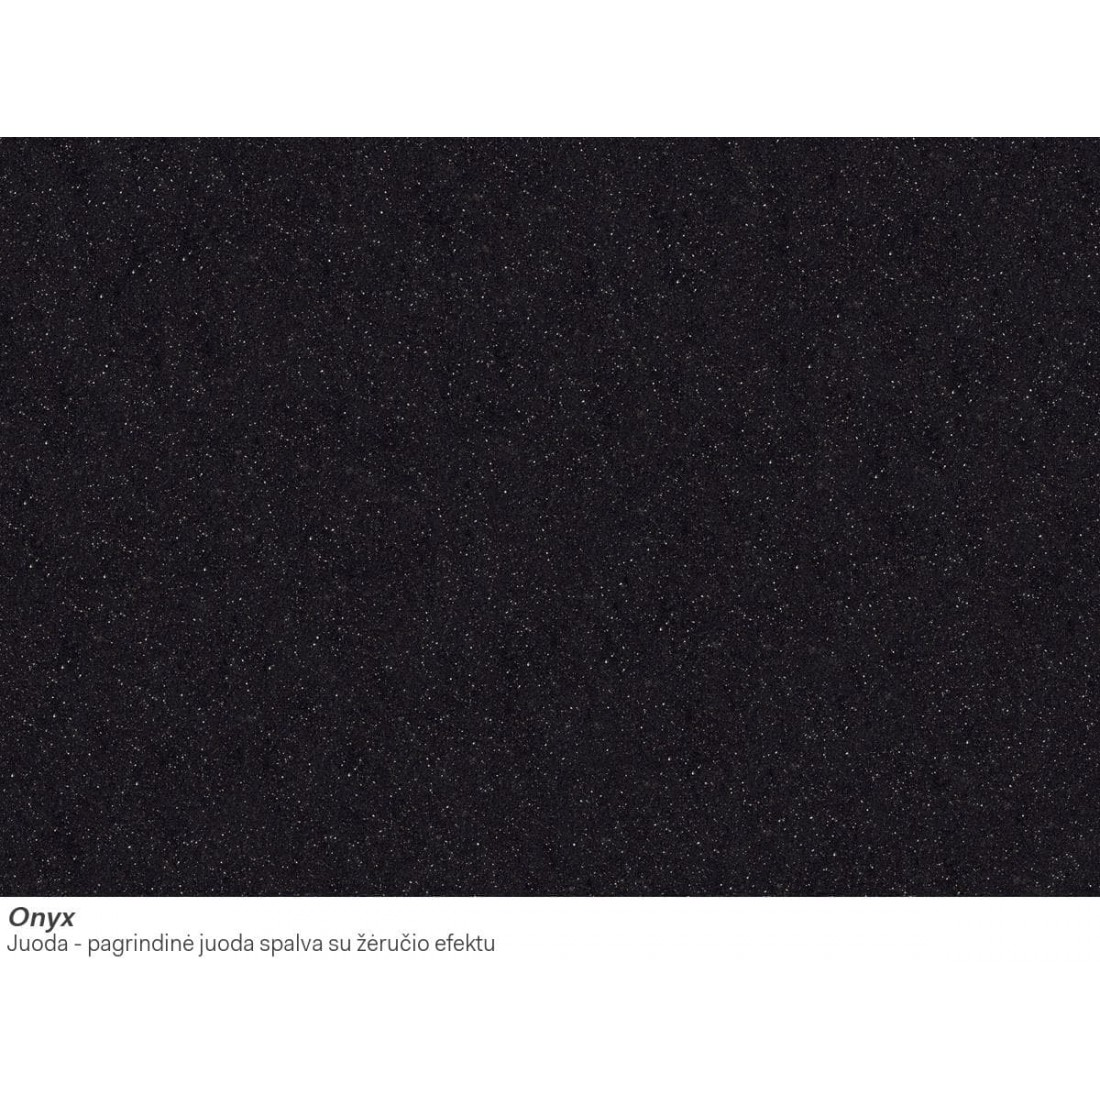 Akmens masės plautuvė Franke Kubus 2 KNG 110-37, Onyx